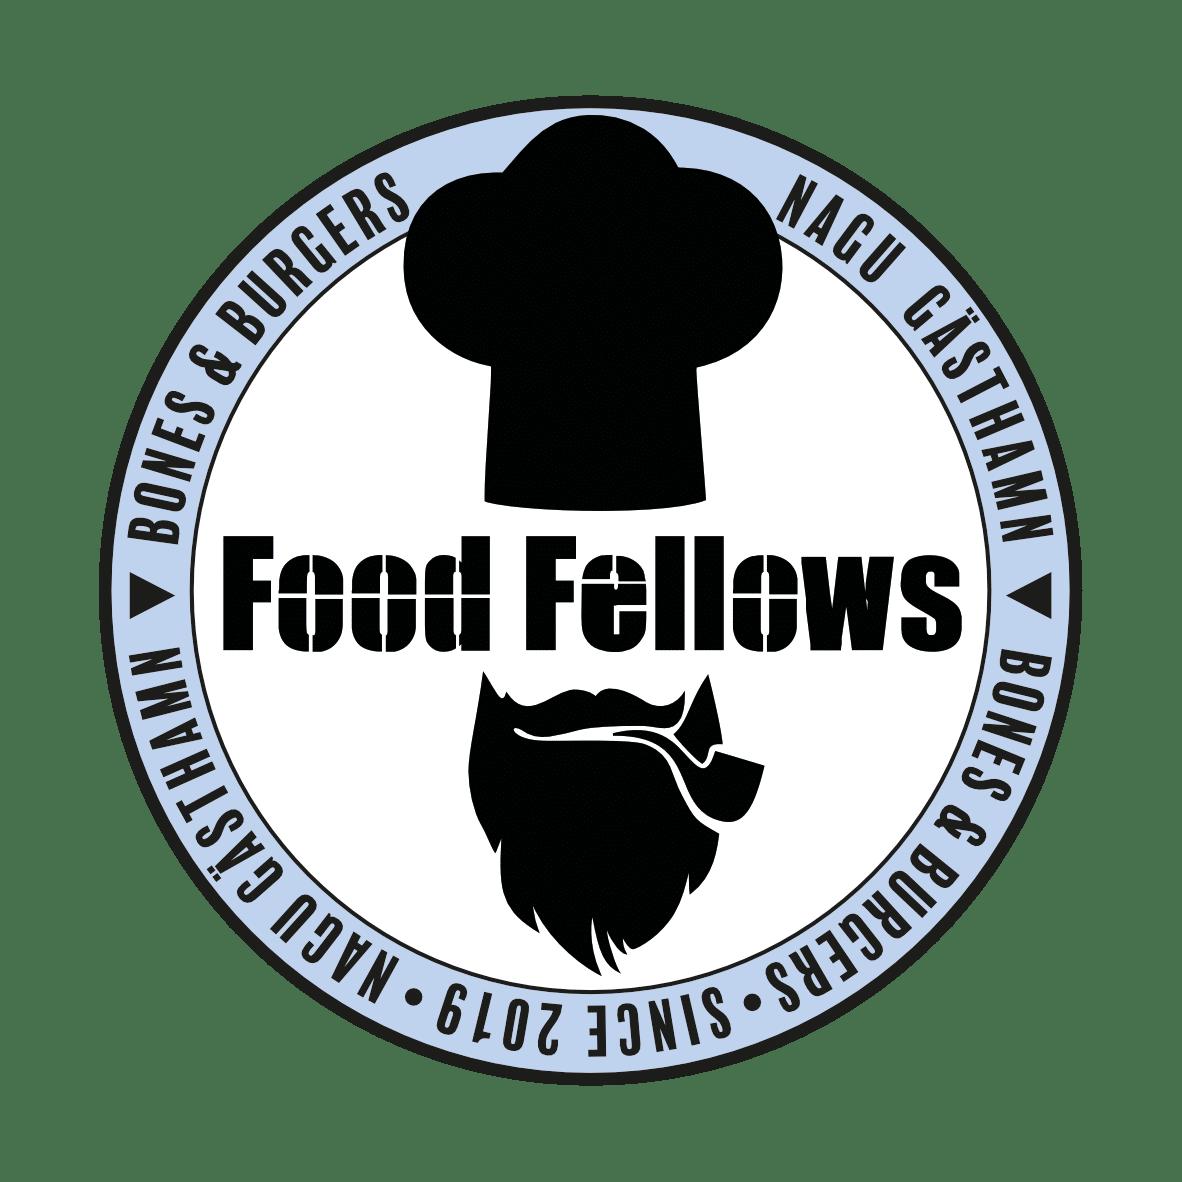 Five Food Fellows Ab